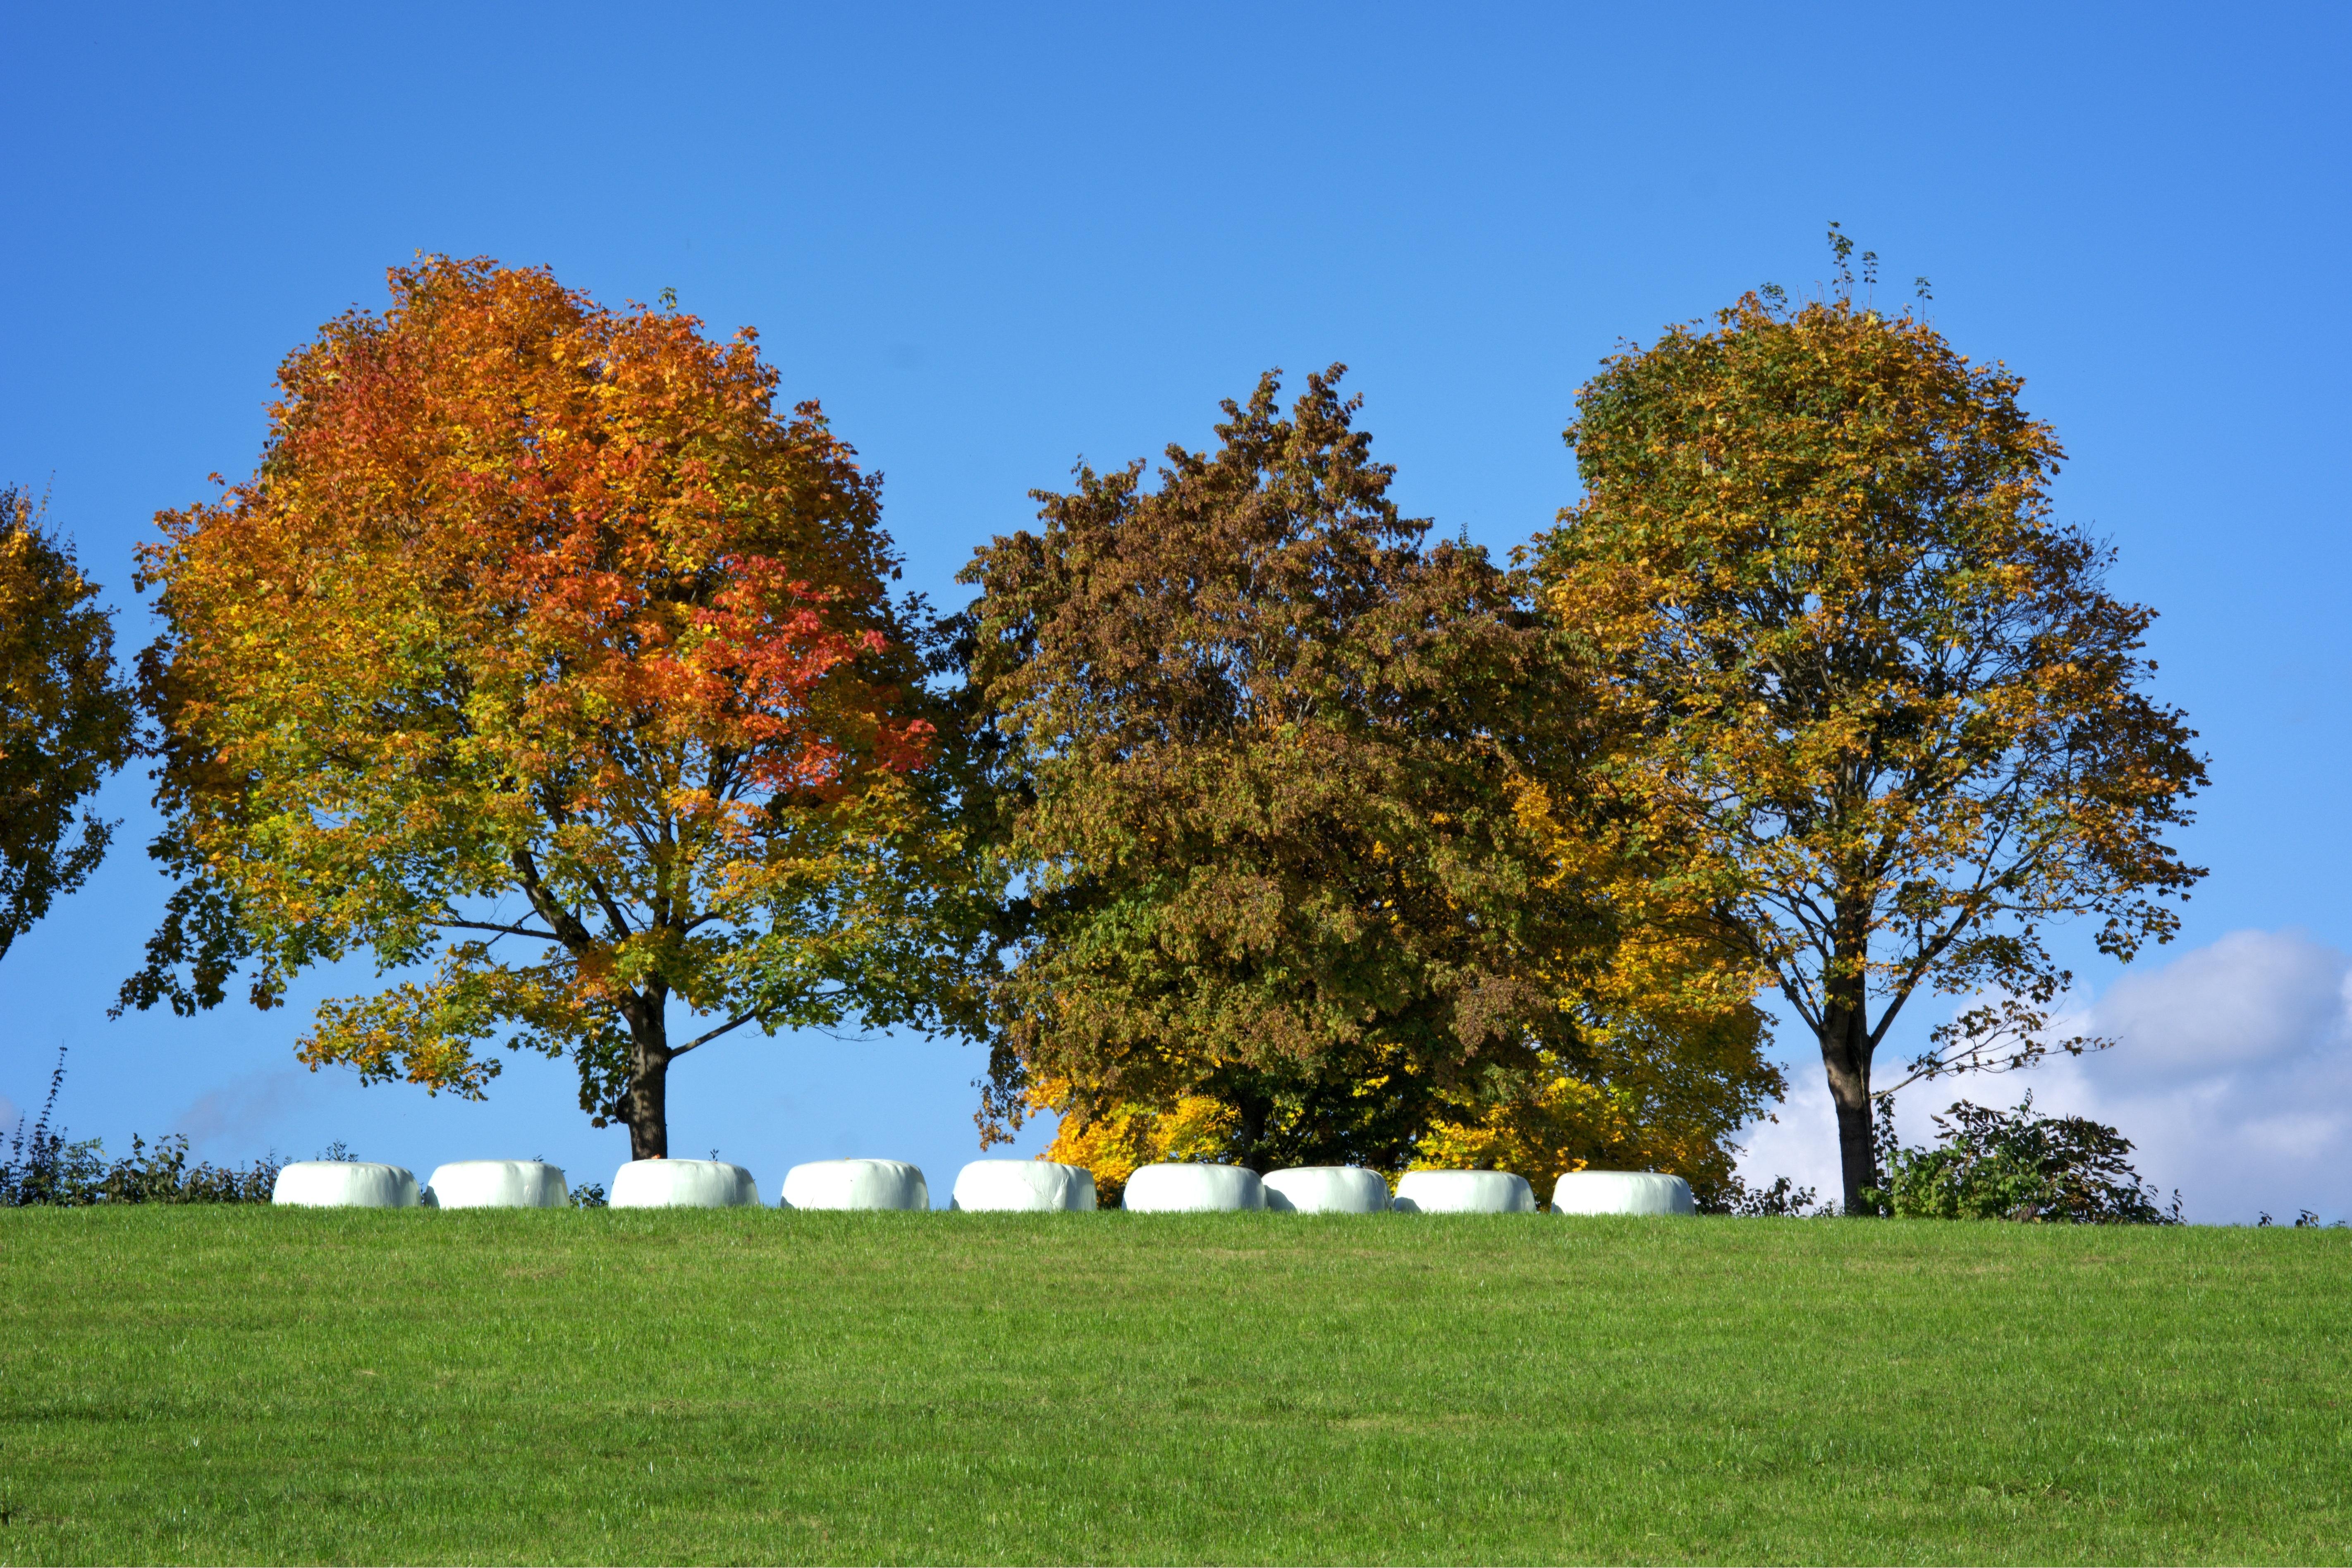 Kostenlose foto : Landschaft, Baum, Natur, Gras, Gruppe, Himmel ...